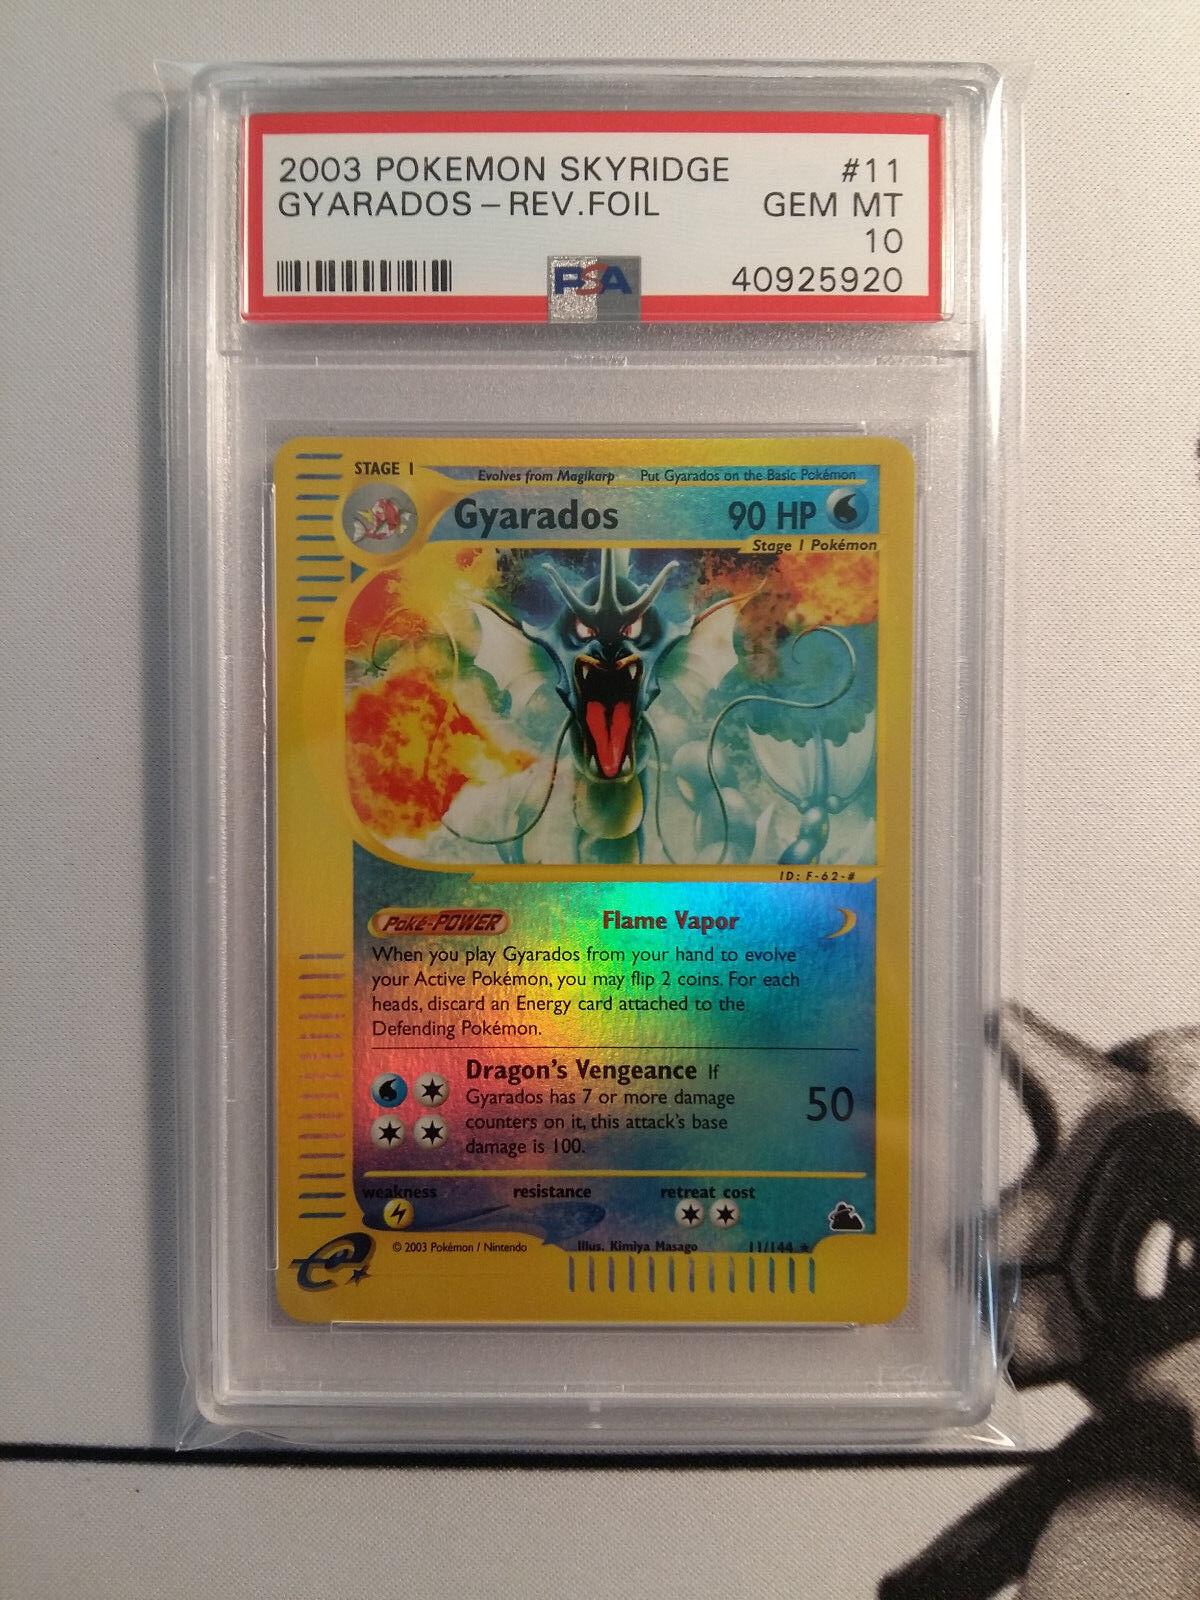 Pokemon 2003 Skyridge Gyarados 11 144 Reverse Holo Foil Foil Foil PSA 10 GEM MINT 7378bc